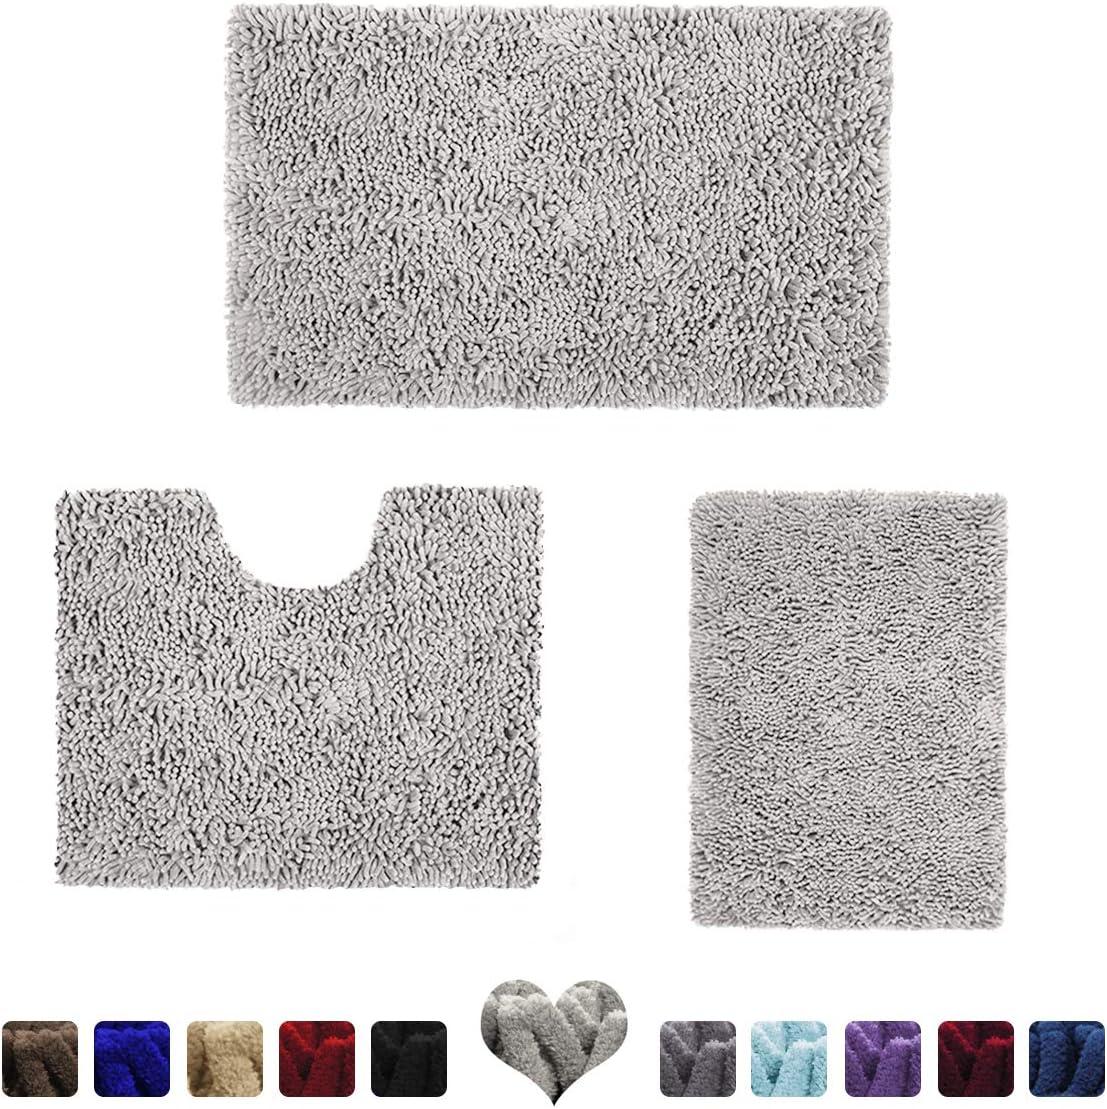 HOMEIDEAS 3 Pieces Bathroom Rugs Set Light Grey, Extra Soft Chenille Bath Rugs Mat, Absorbent Plush Shaggy Bath Rugs, Machine Washable & Non Slip Bath Rugs for Bathroom, Tub, Shower